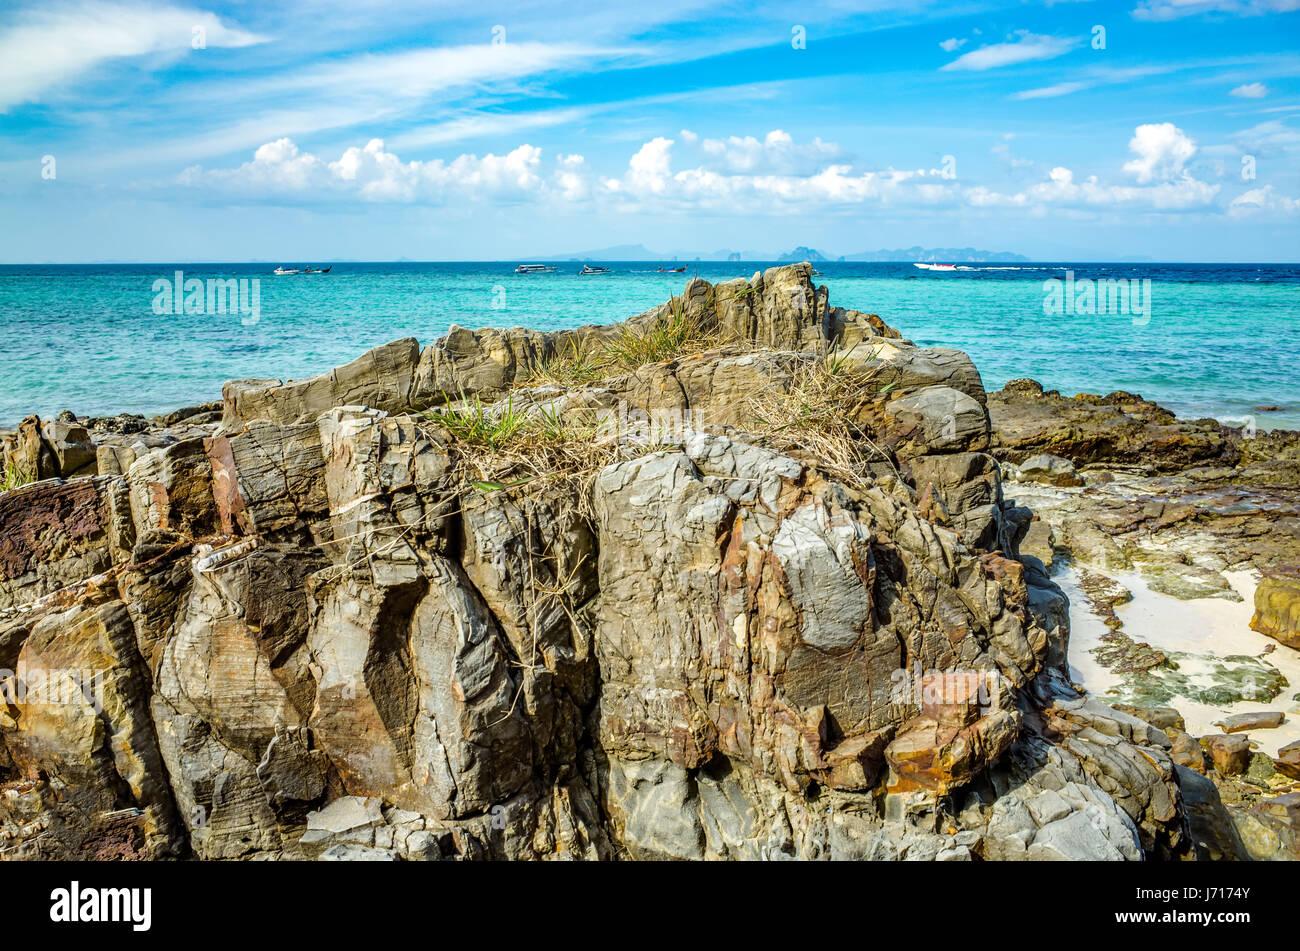 The Andaman sea of the Indian ocean, Phuket - Stock Image